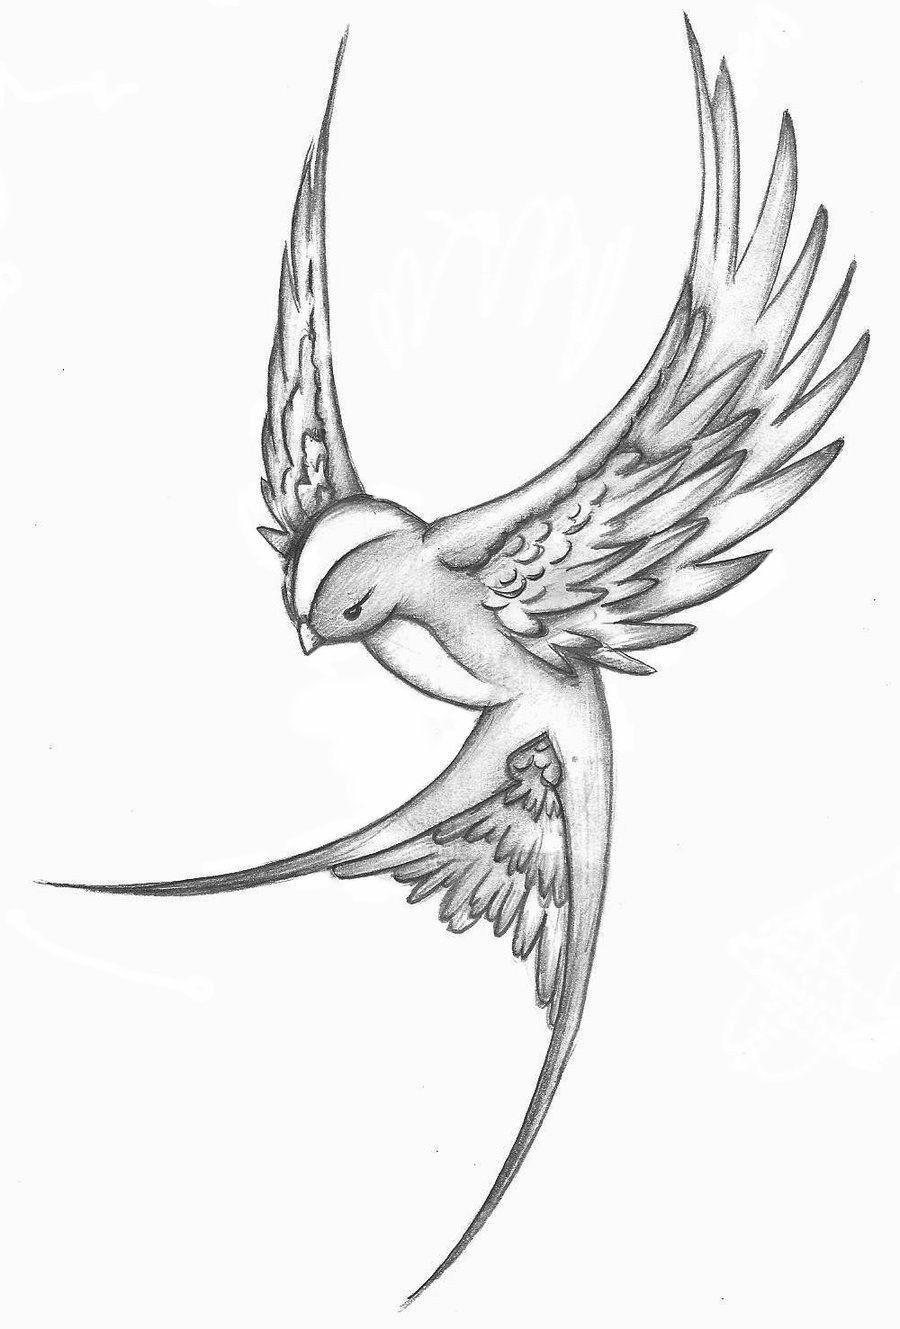 Small Flying Bird Silhouette Tattoo Flying Birds Tattoo Tumblr Sparrow Tattoo Design Cool Tattoo Drawings Tattoo Design Drawings